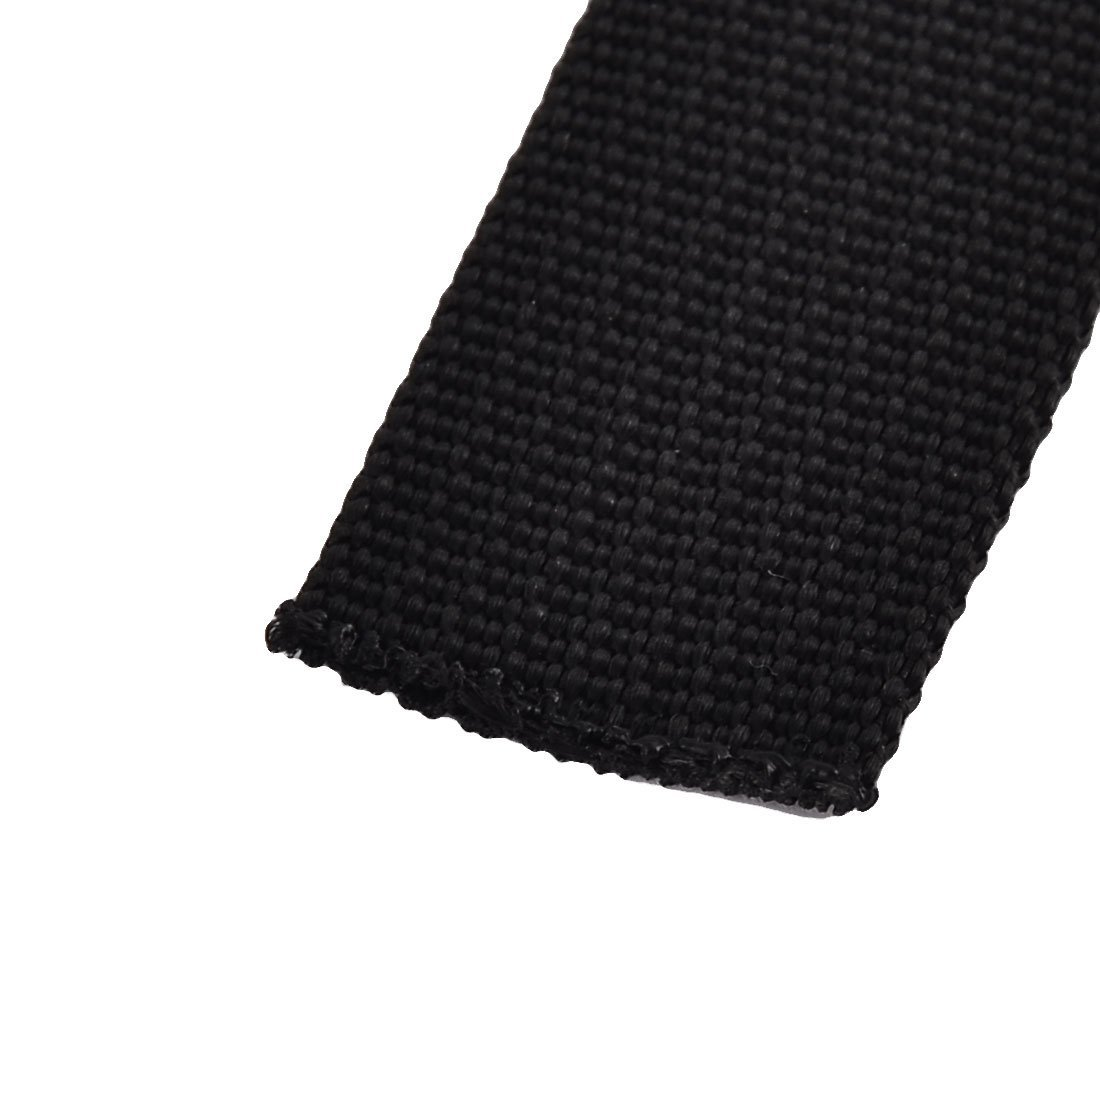 EbuyChX Naylon sa bahay Travel Adjustable Suitcase Bagahe strap belt buckle 2.5 x 100cm Black